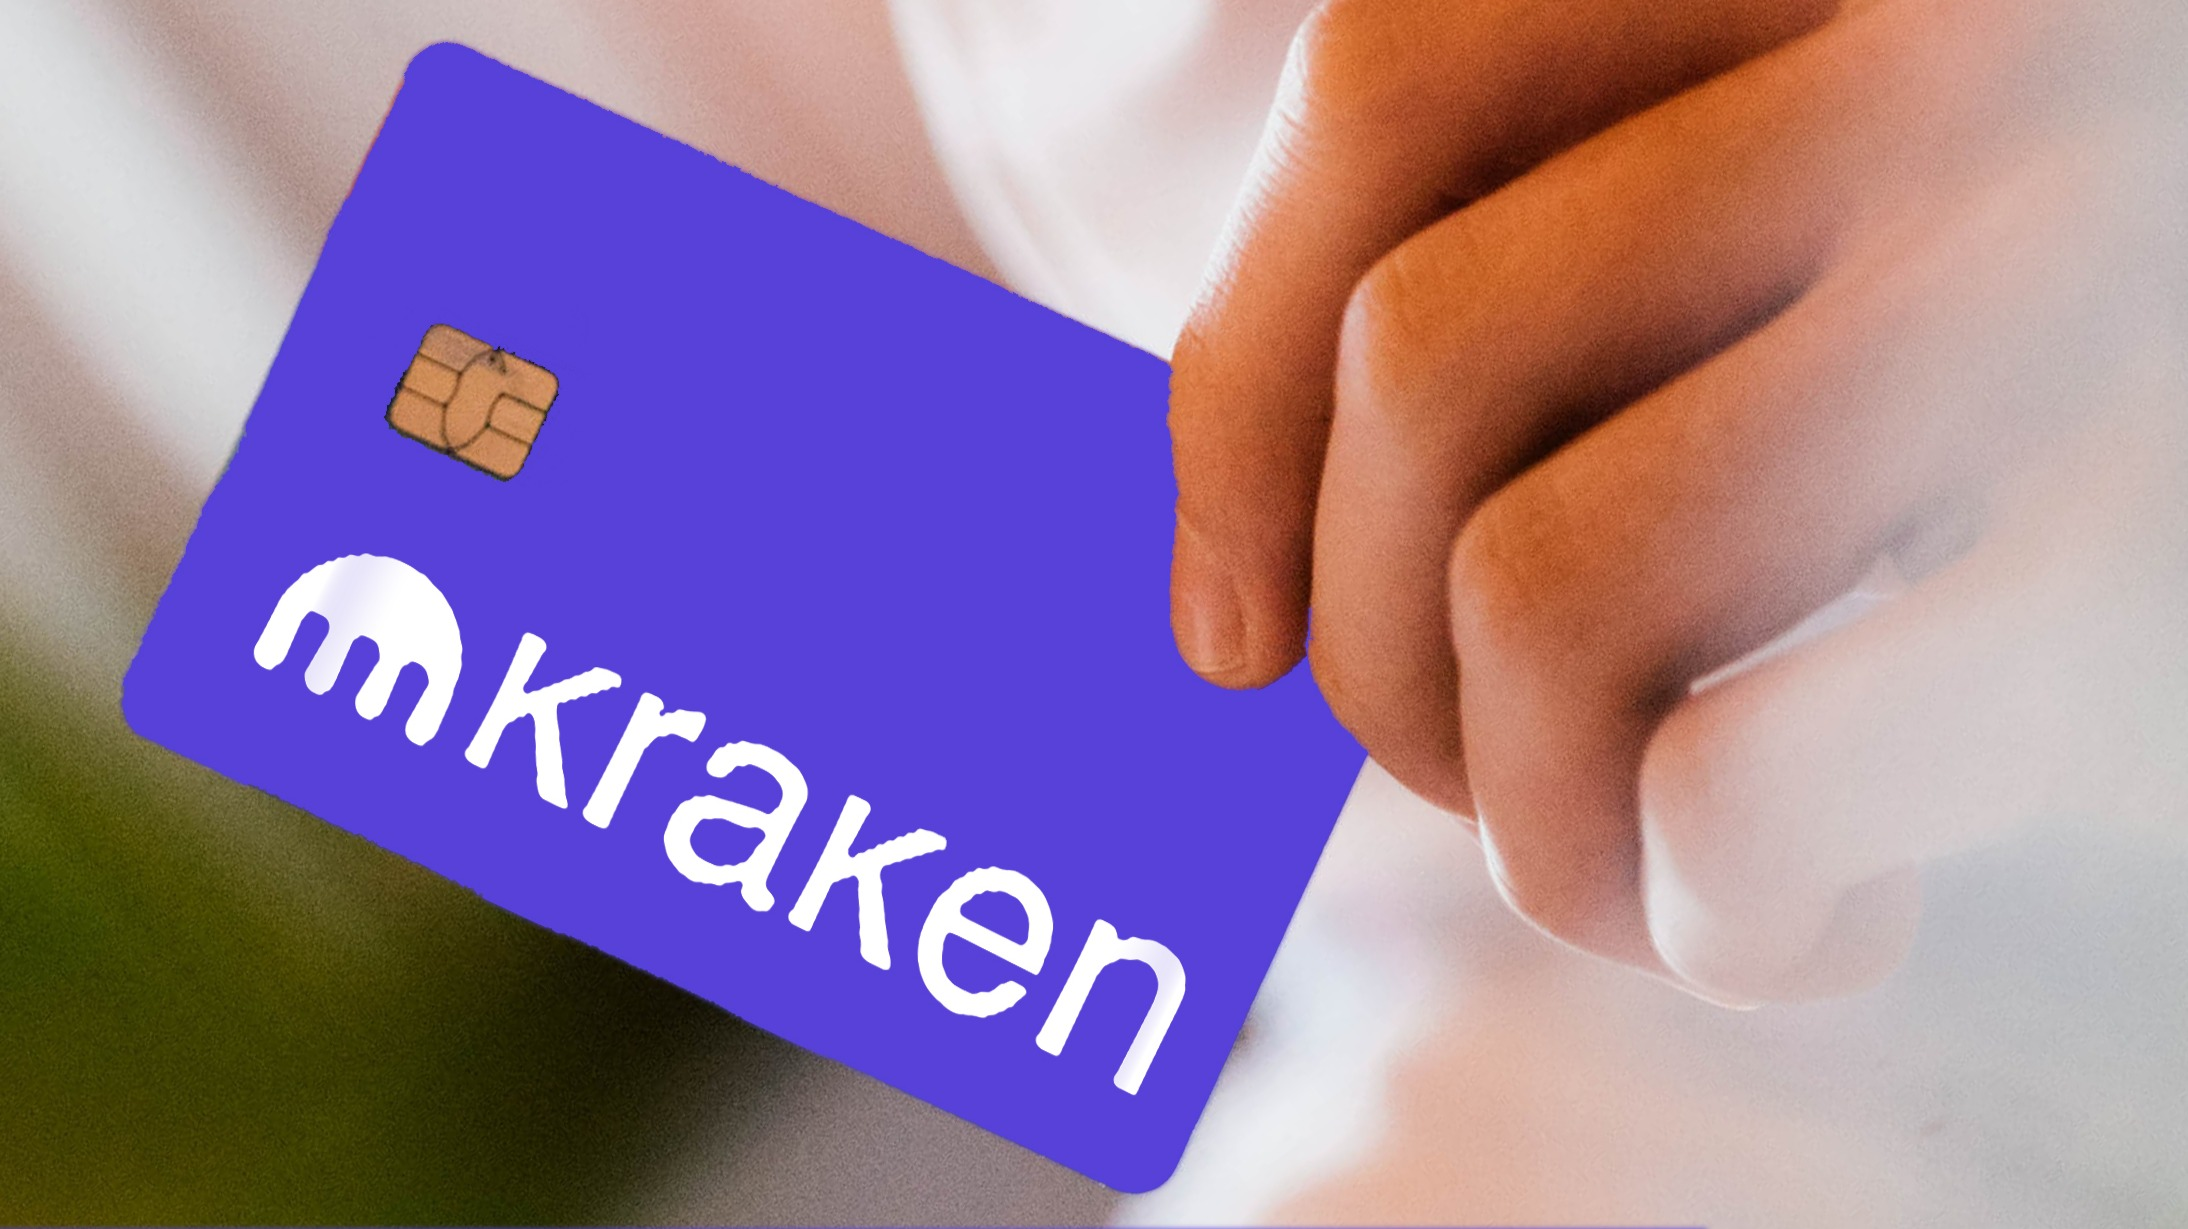 Kraken Card (Not real)